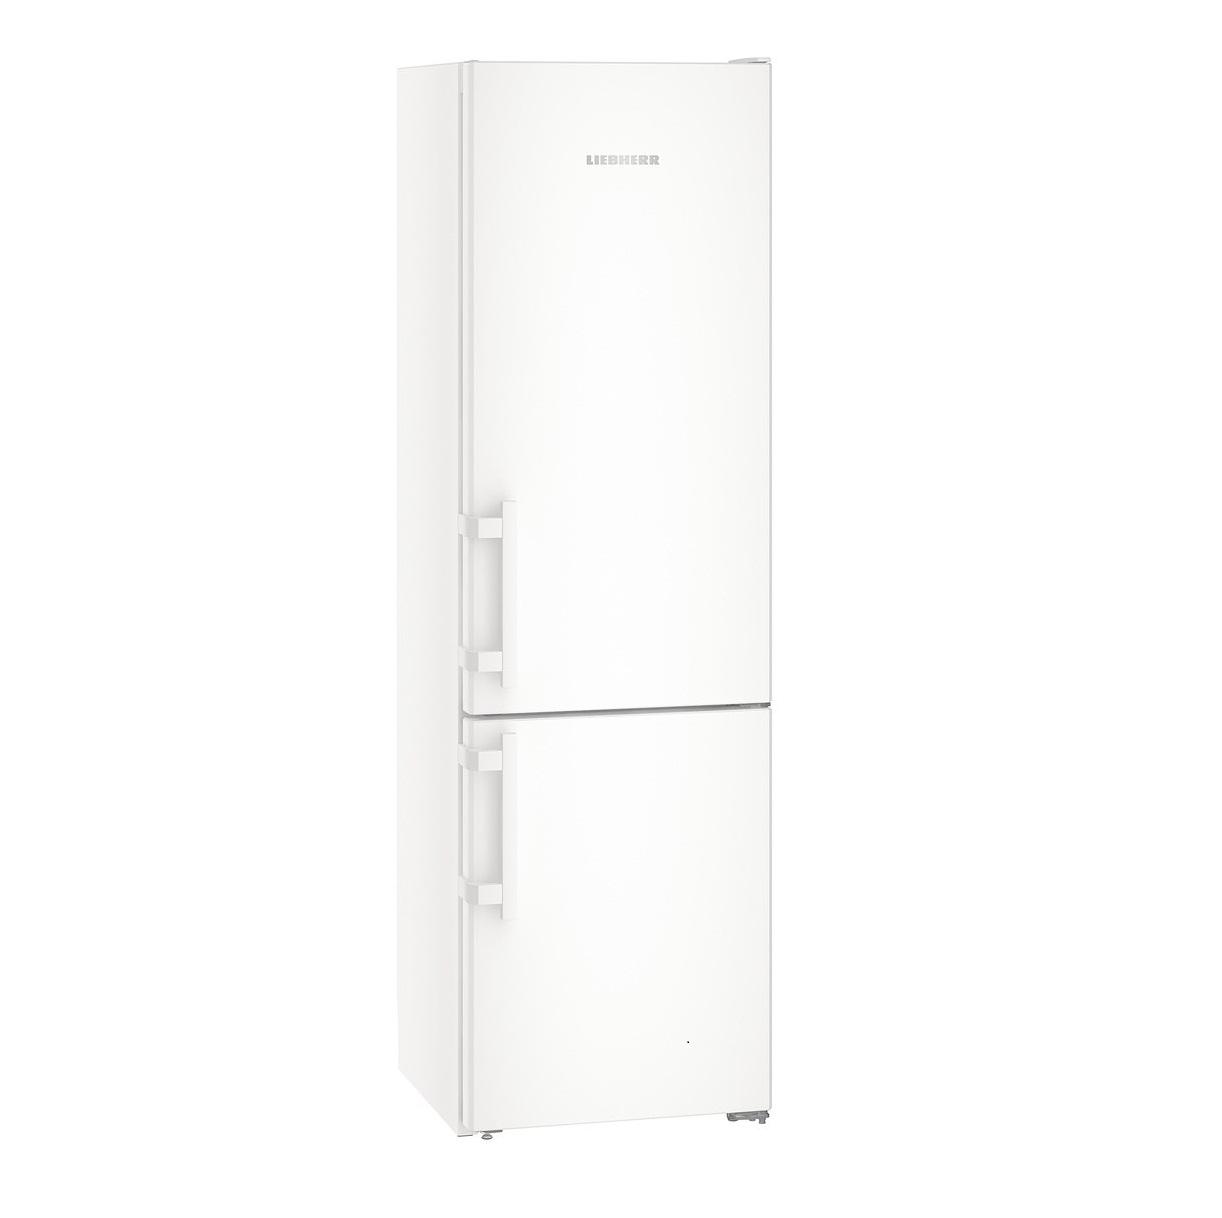 Liebherr frižider kombinovani CU 4015 - Inelektronik